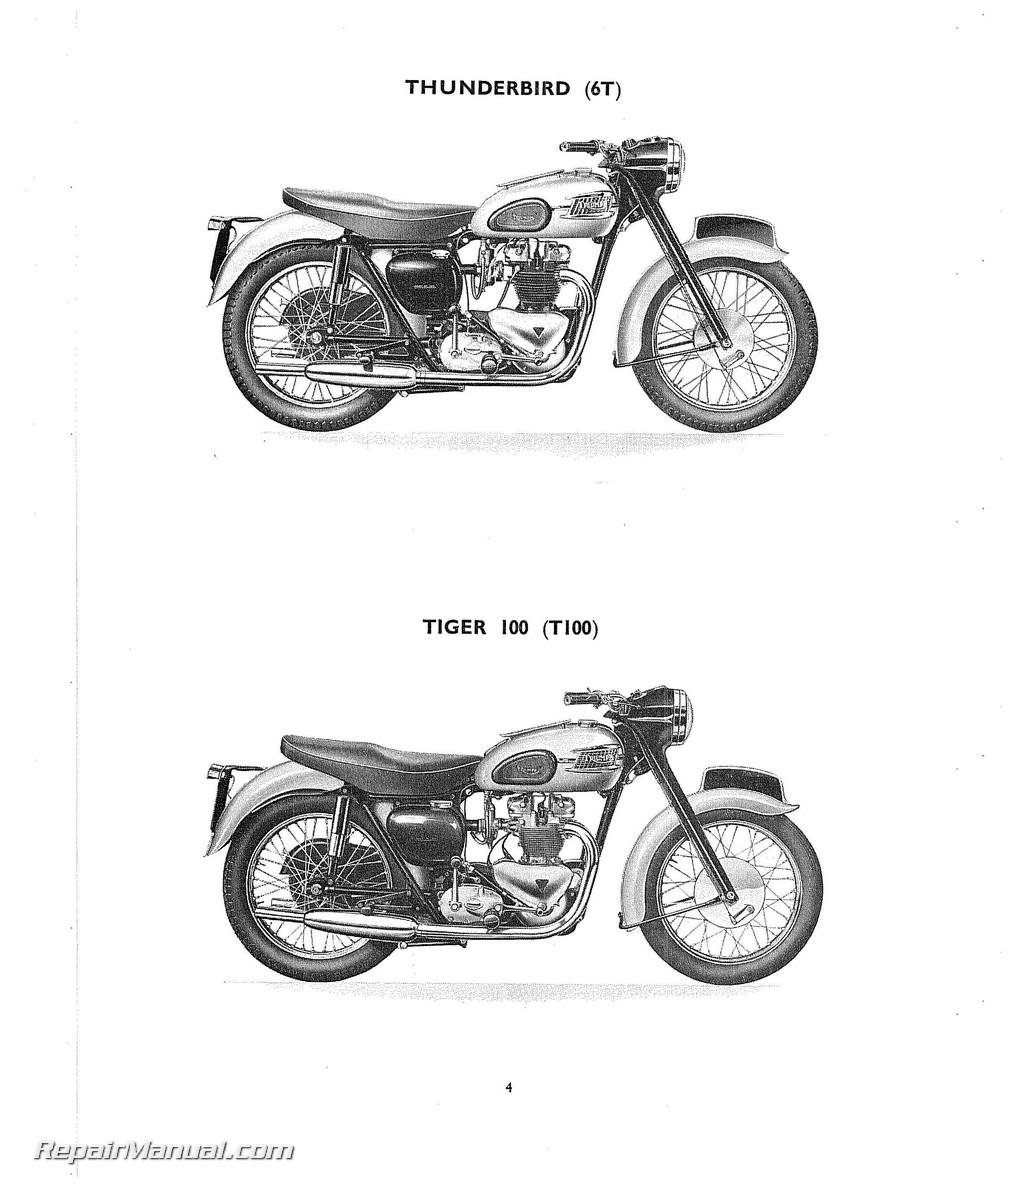 basic car parts diagram motorcycle engine engine parts car engine